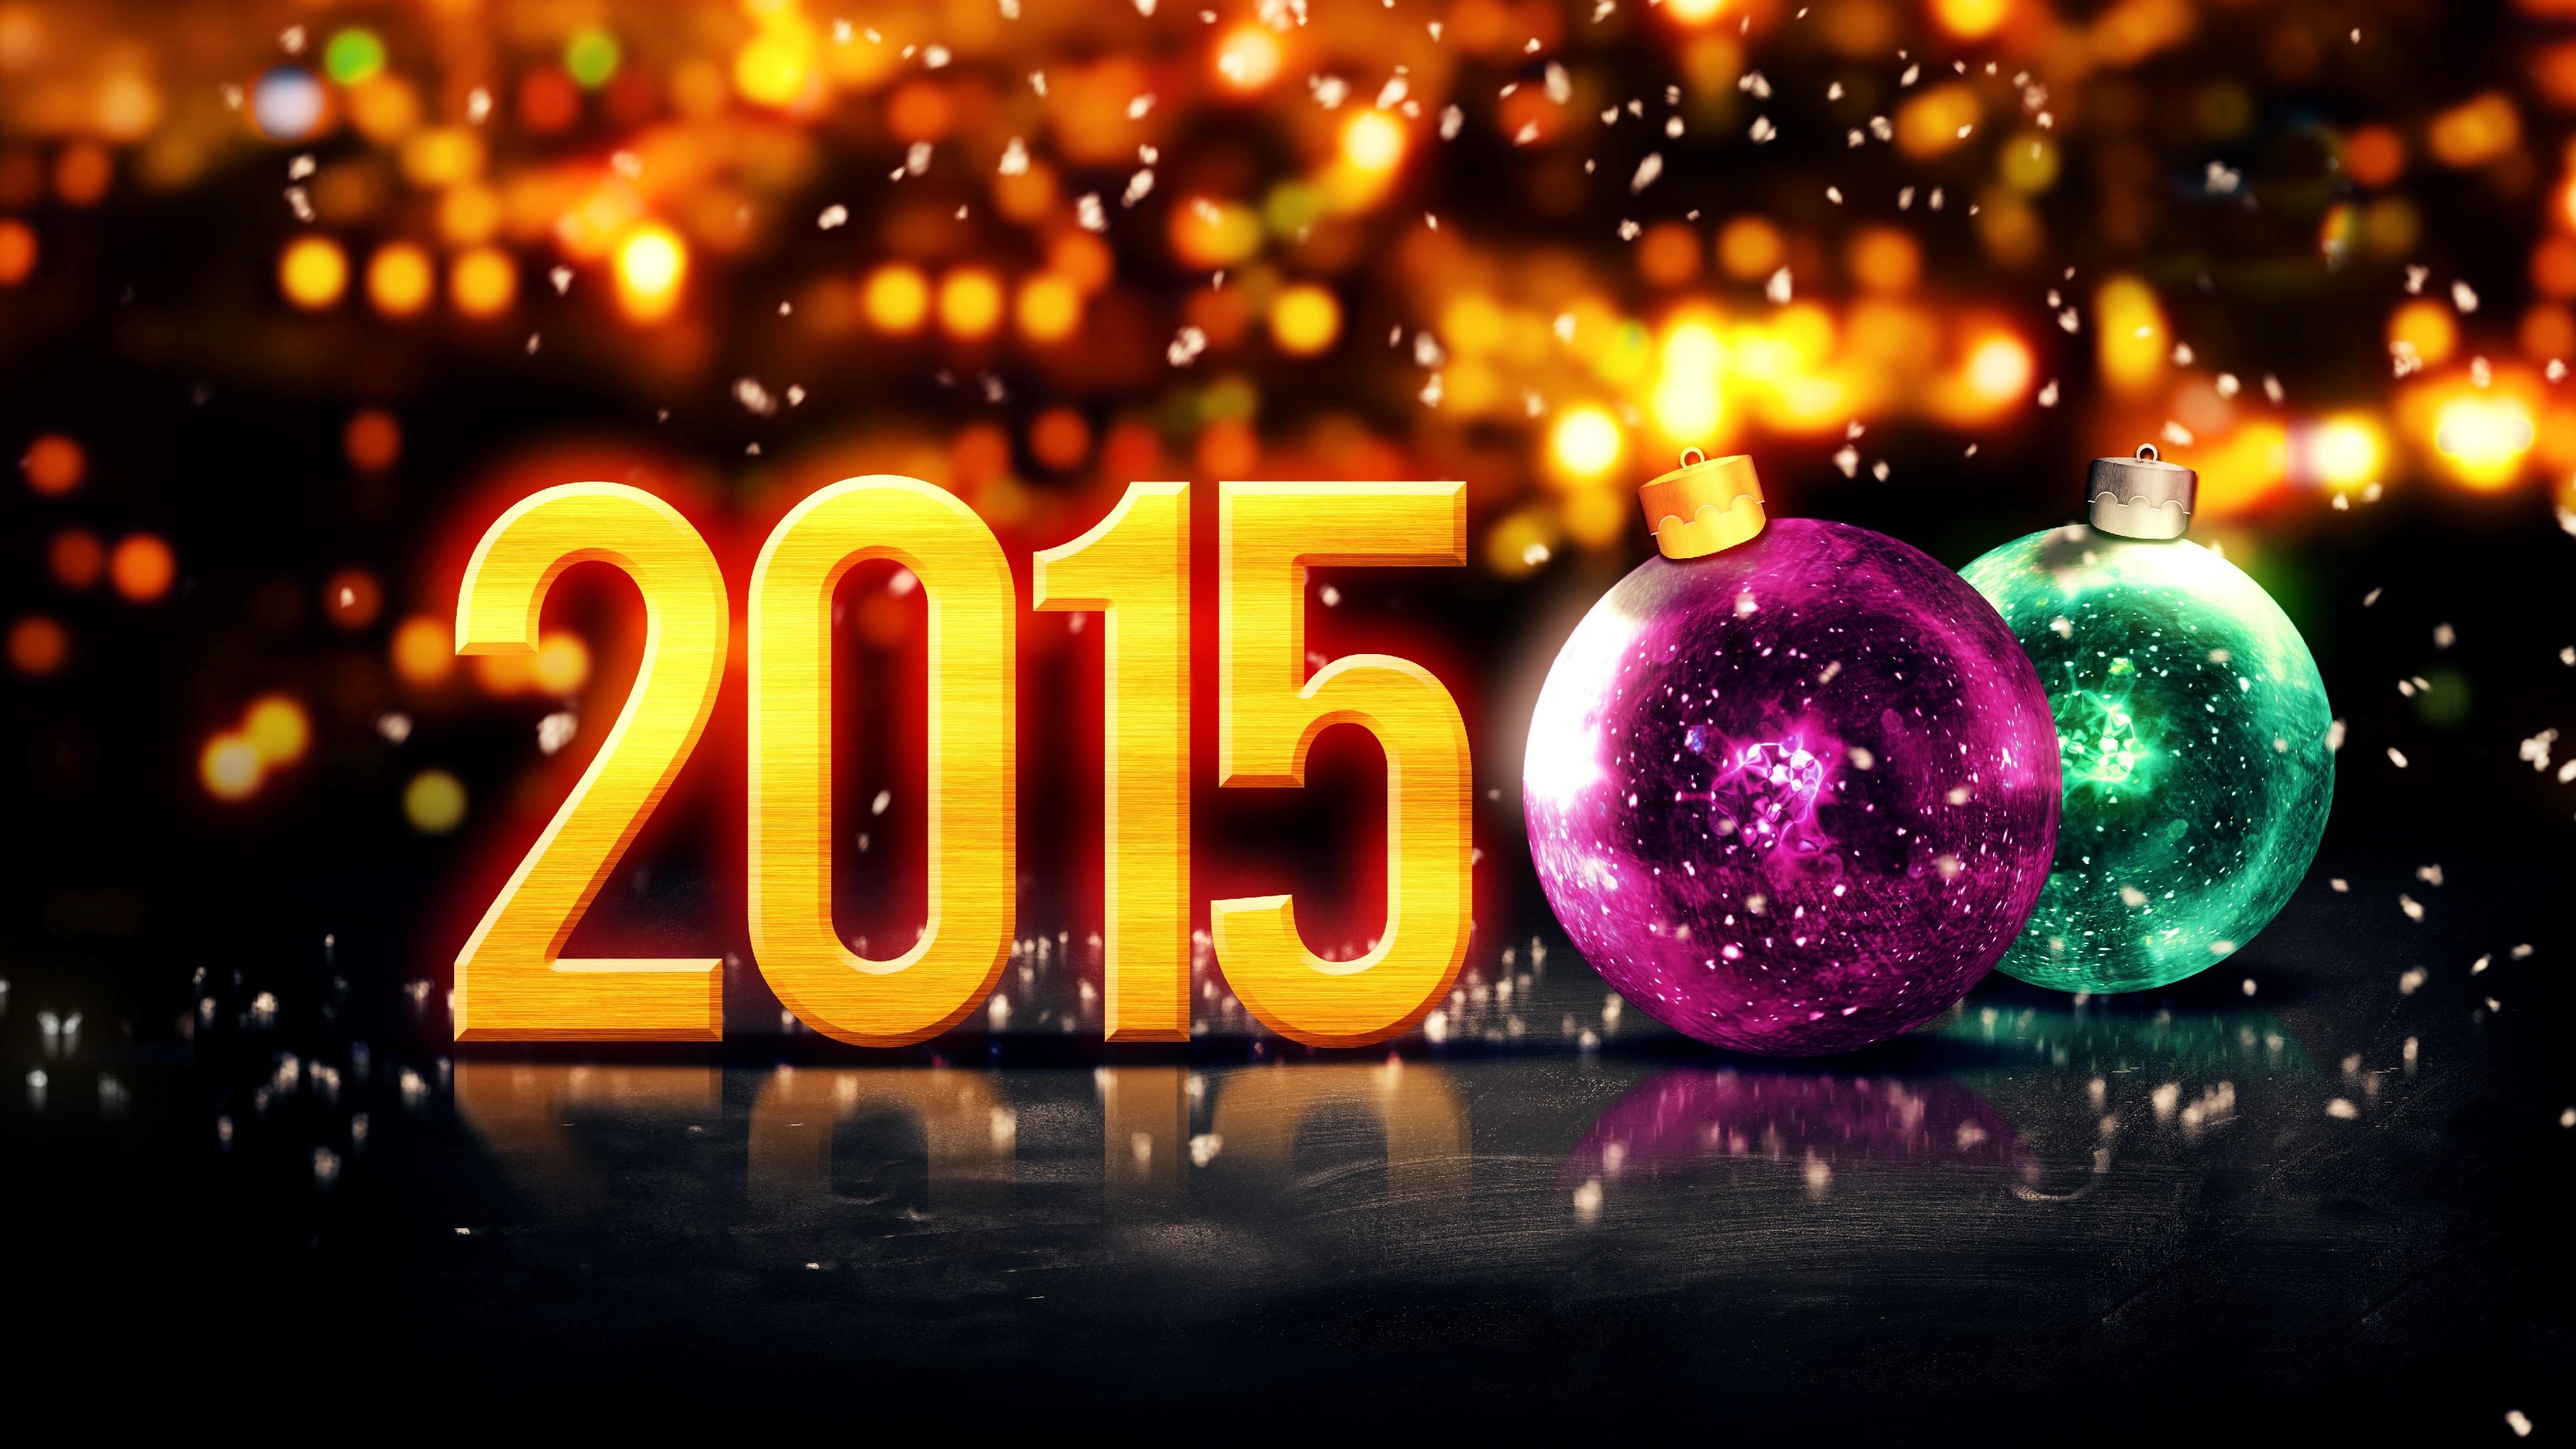 Happy New Year 2015 Ultra HD wallpaper UHD WallpapersNet 3840x2160